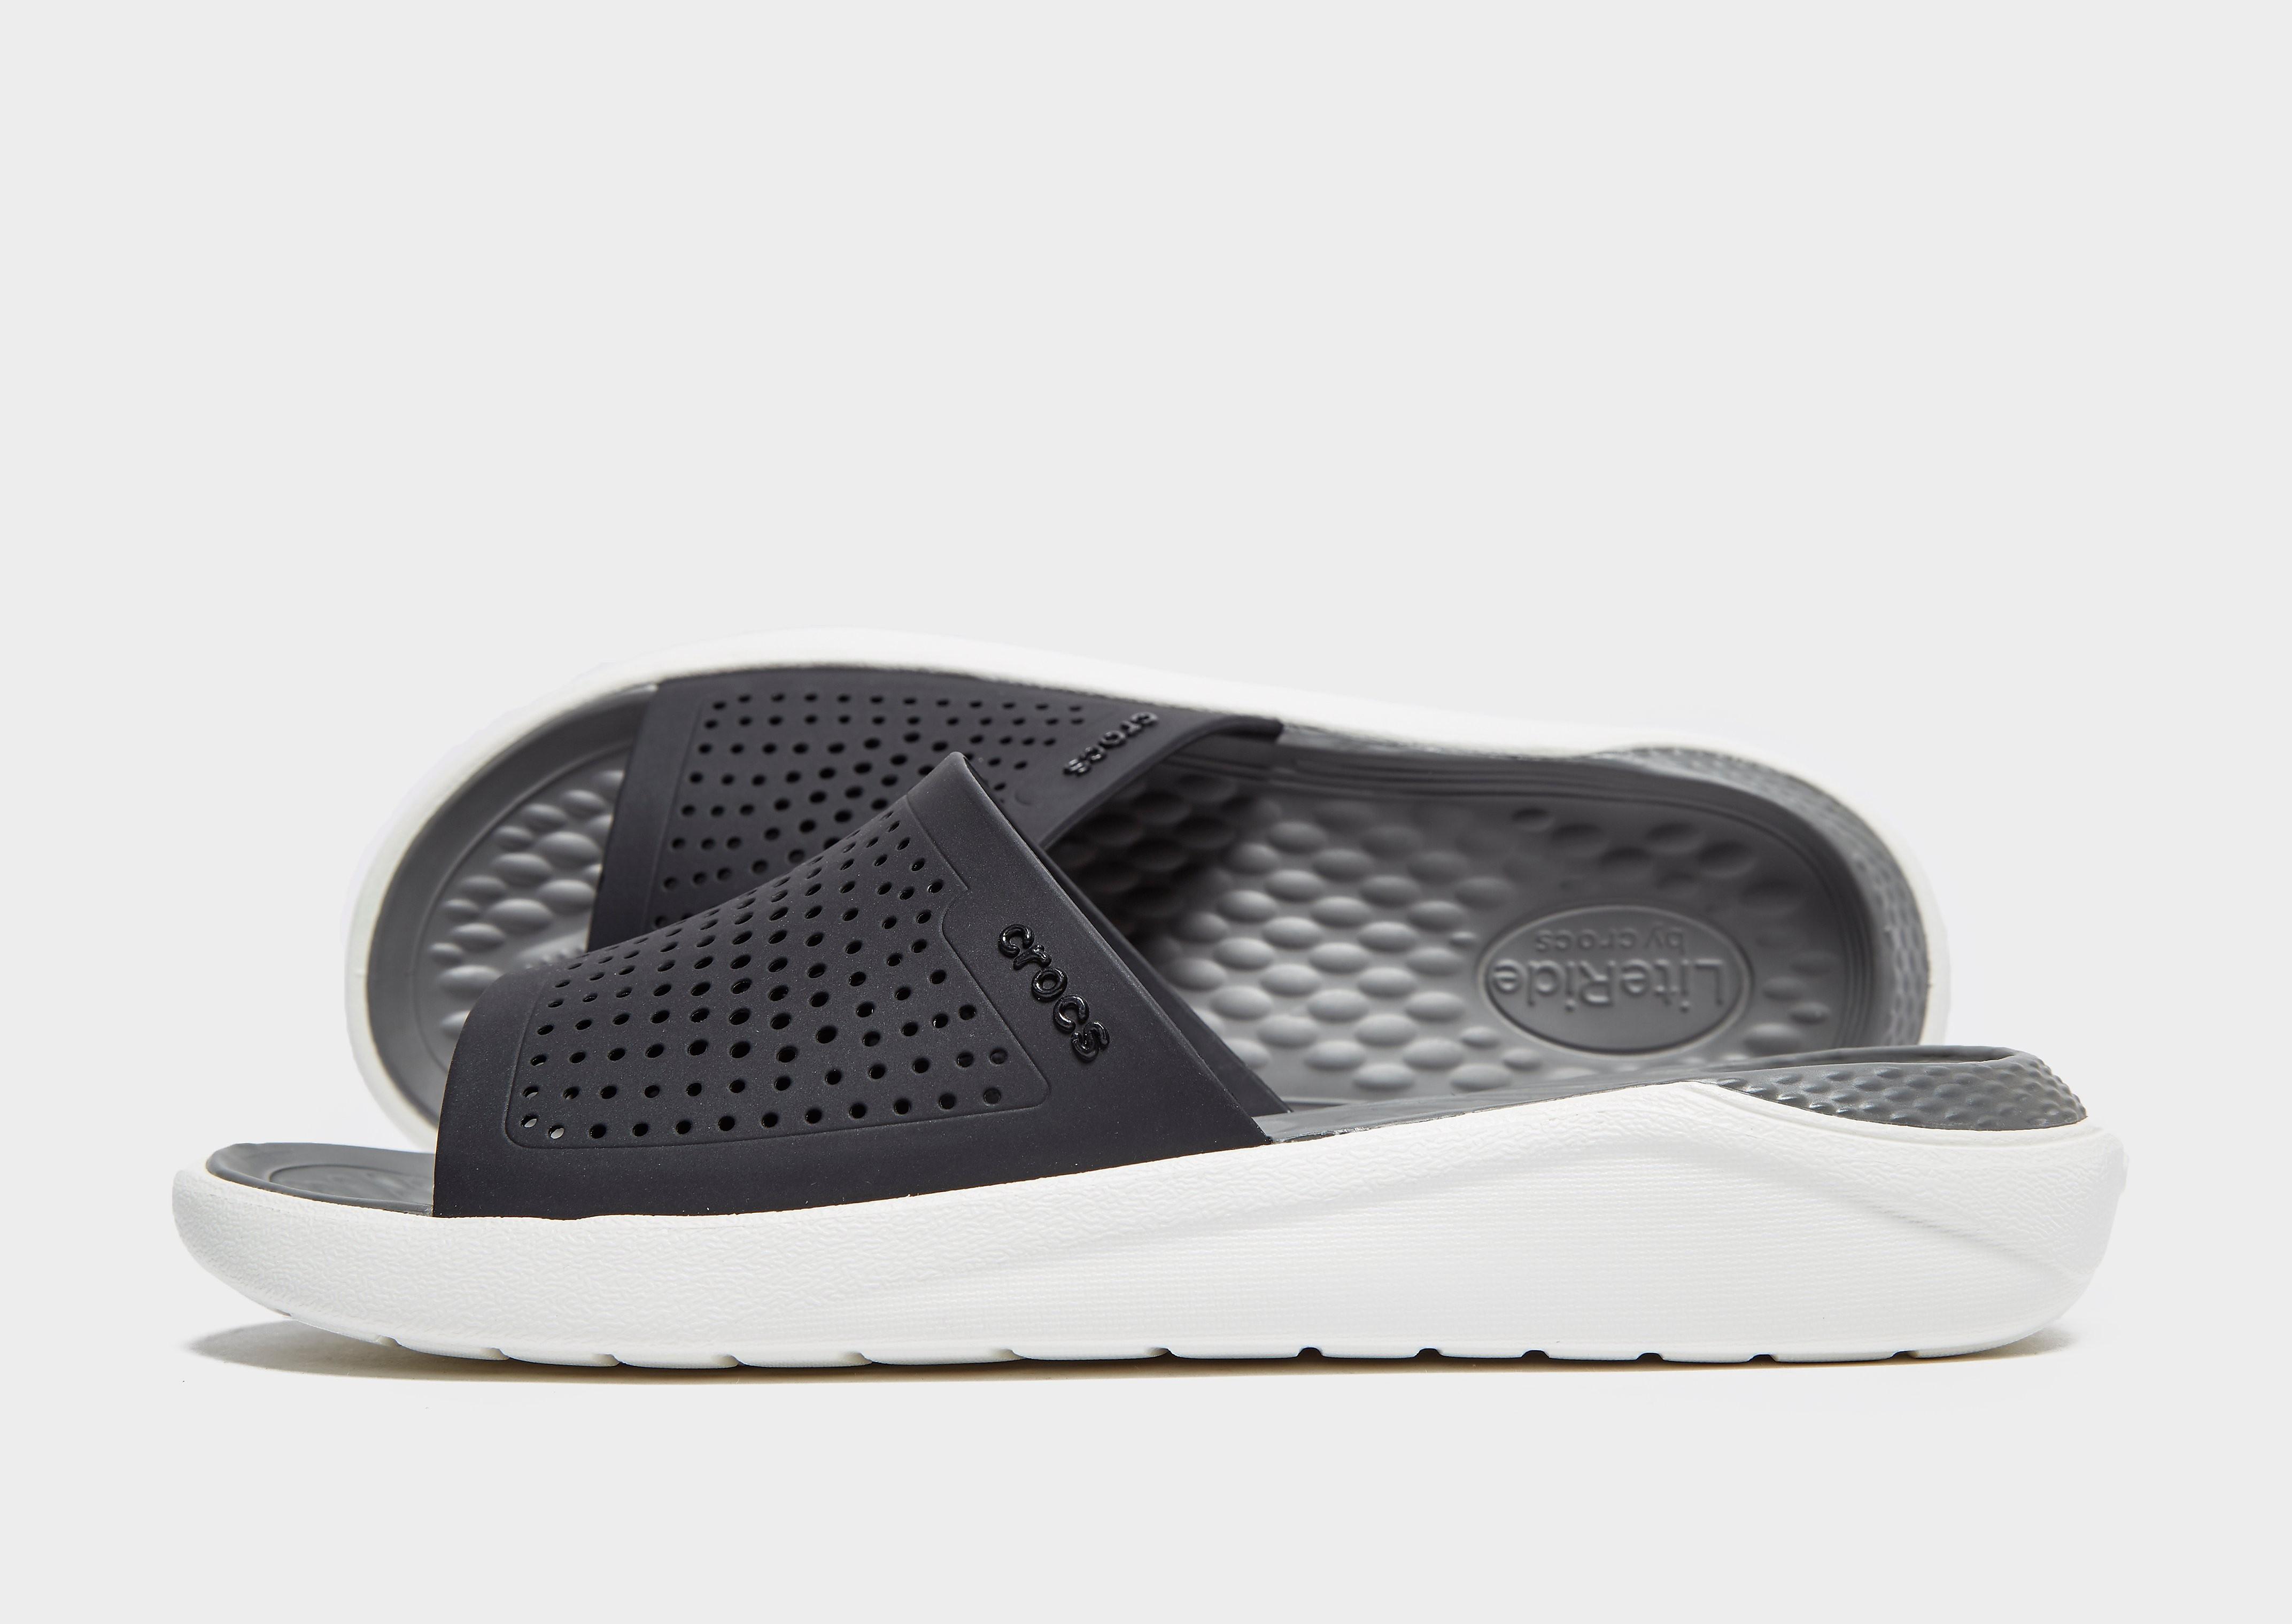 Crocs LightRide Slides Herren - Grau - Mens, Grau